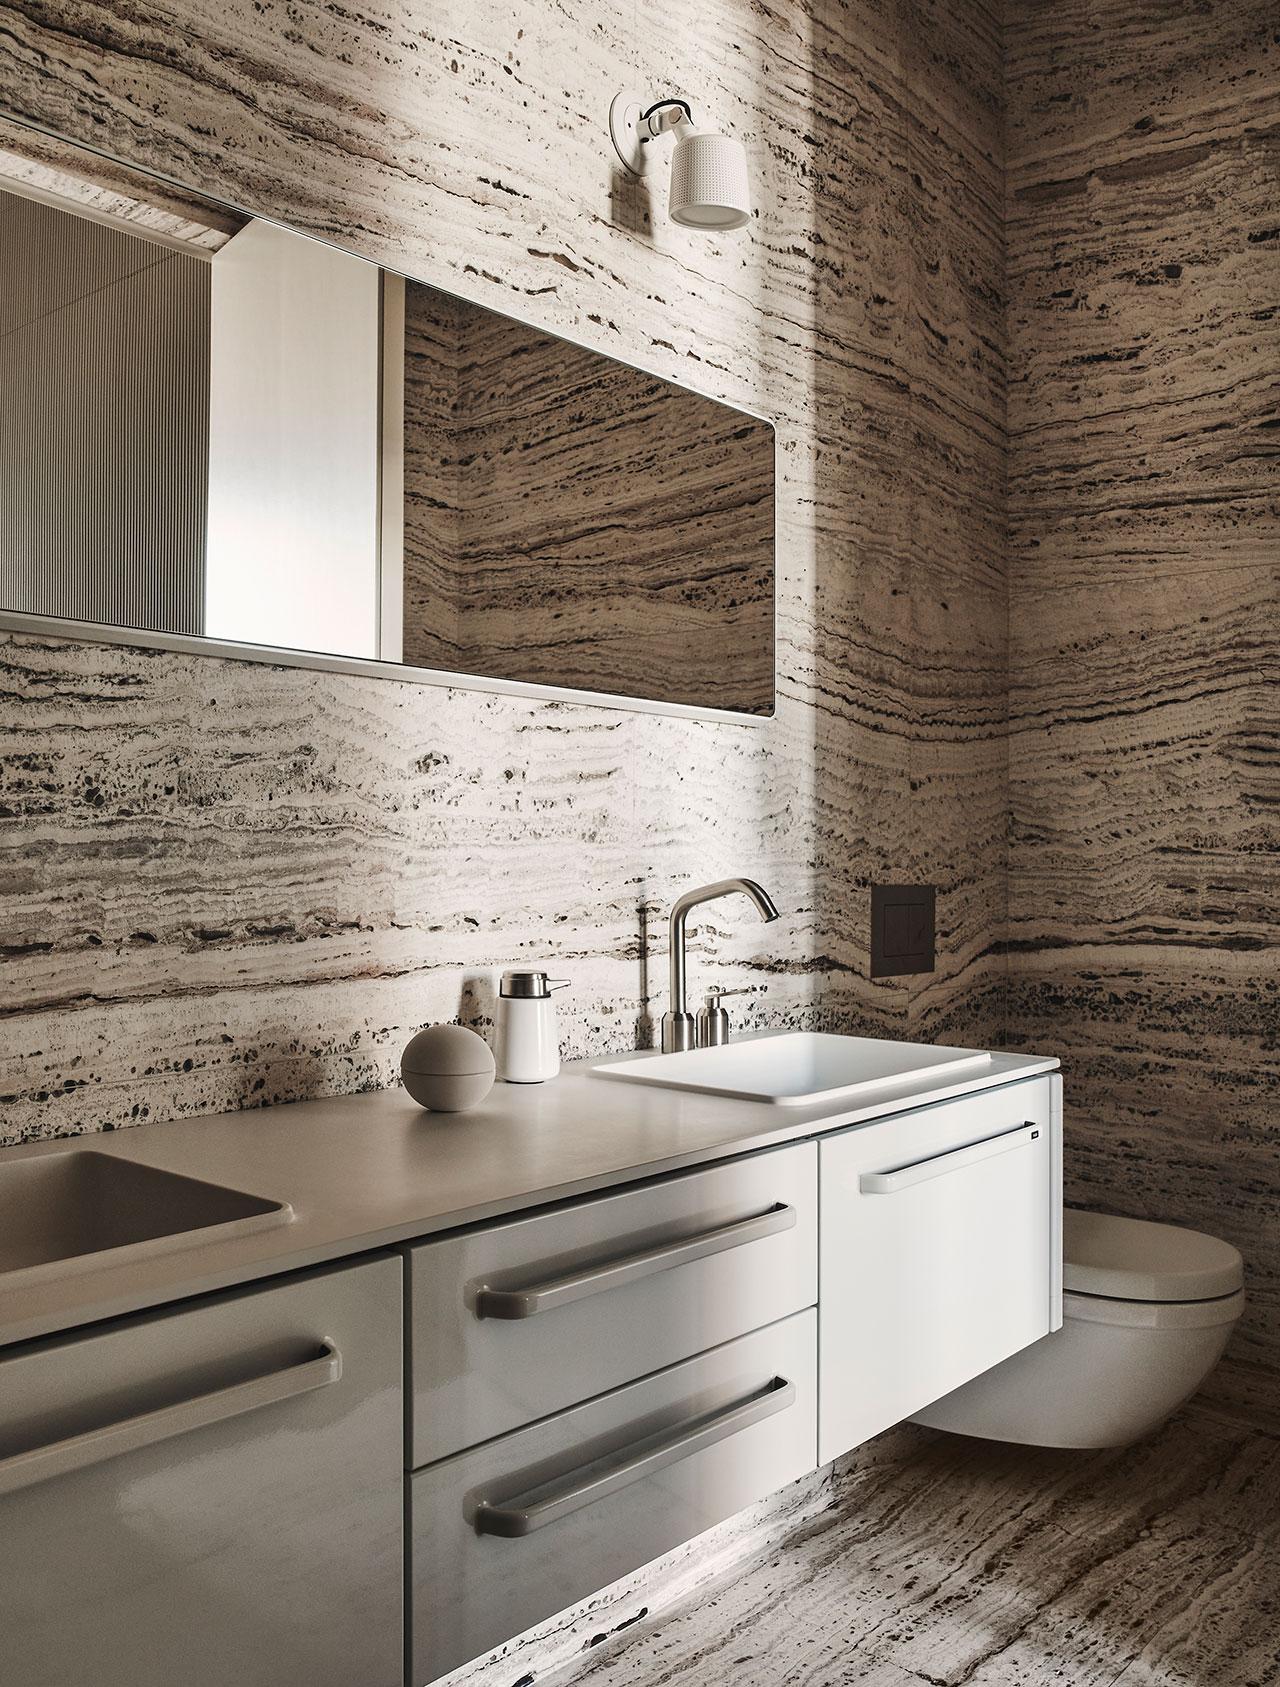 Photography by Adrian Gaut.Styling by Colin King. © Vipp Master bathroom:Perisian travertine,White Vipp pendant lights, White Vipp Bathroom Module, Large, Vipp Bathroom Mirror, Large.